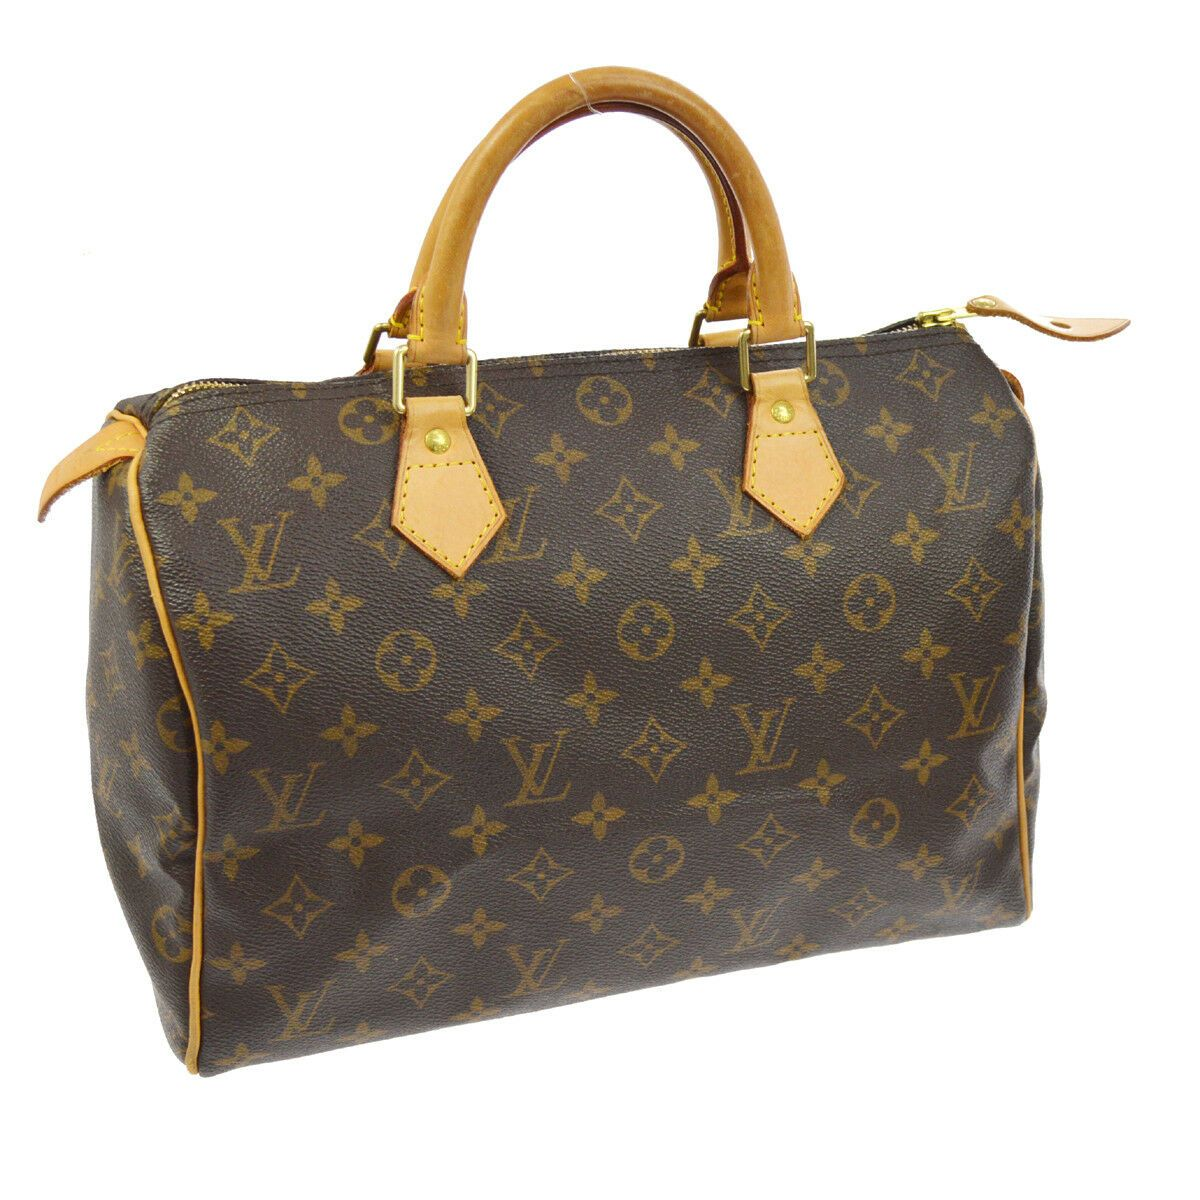 AUTHENTIC LOUIS VUITTON SPEEDY 30 HAND BAG MONOGRAM CANVAS PURSE M41526 A41308g - Ideas of